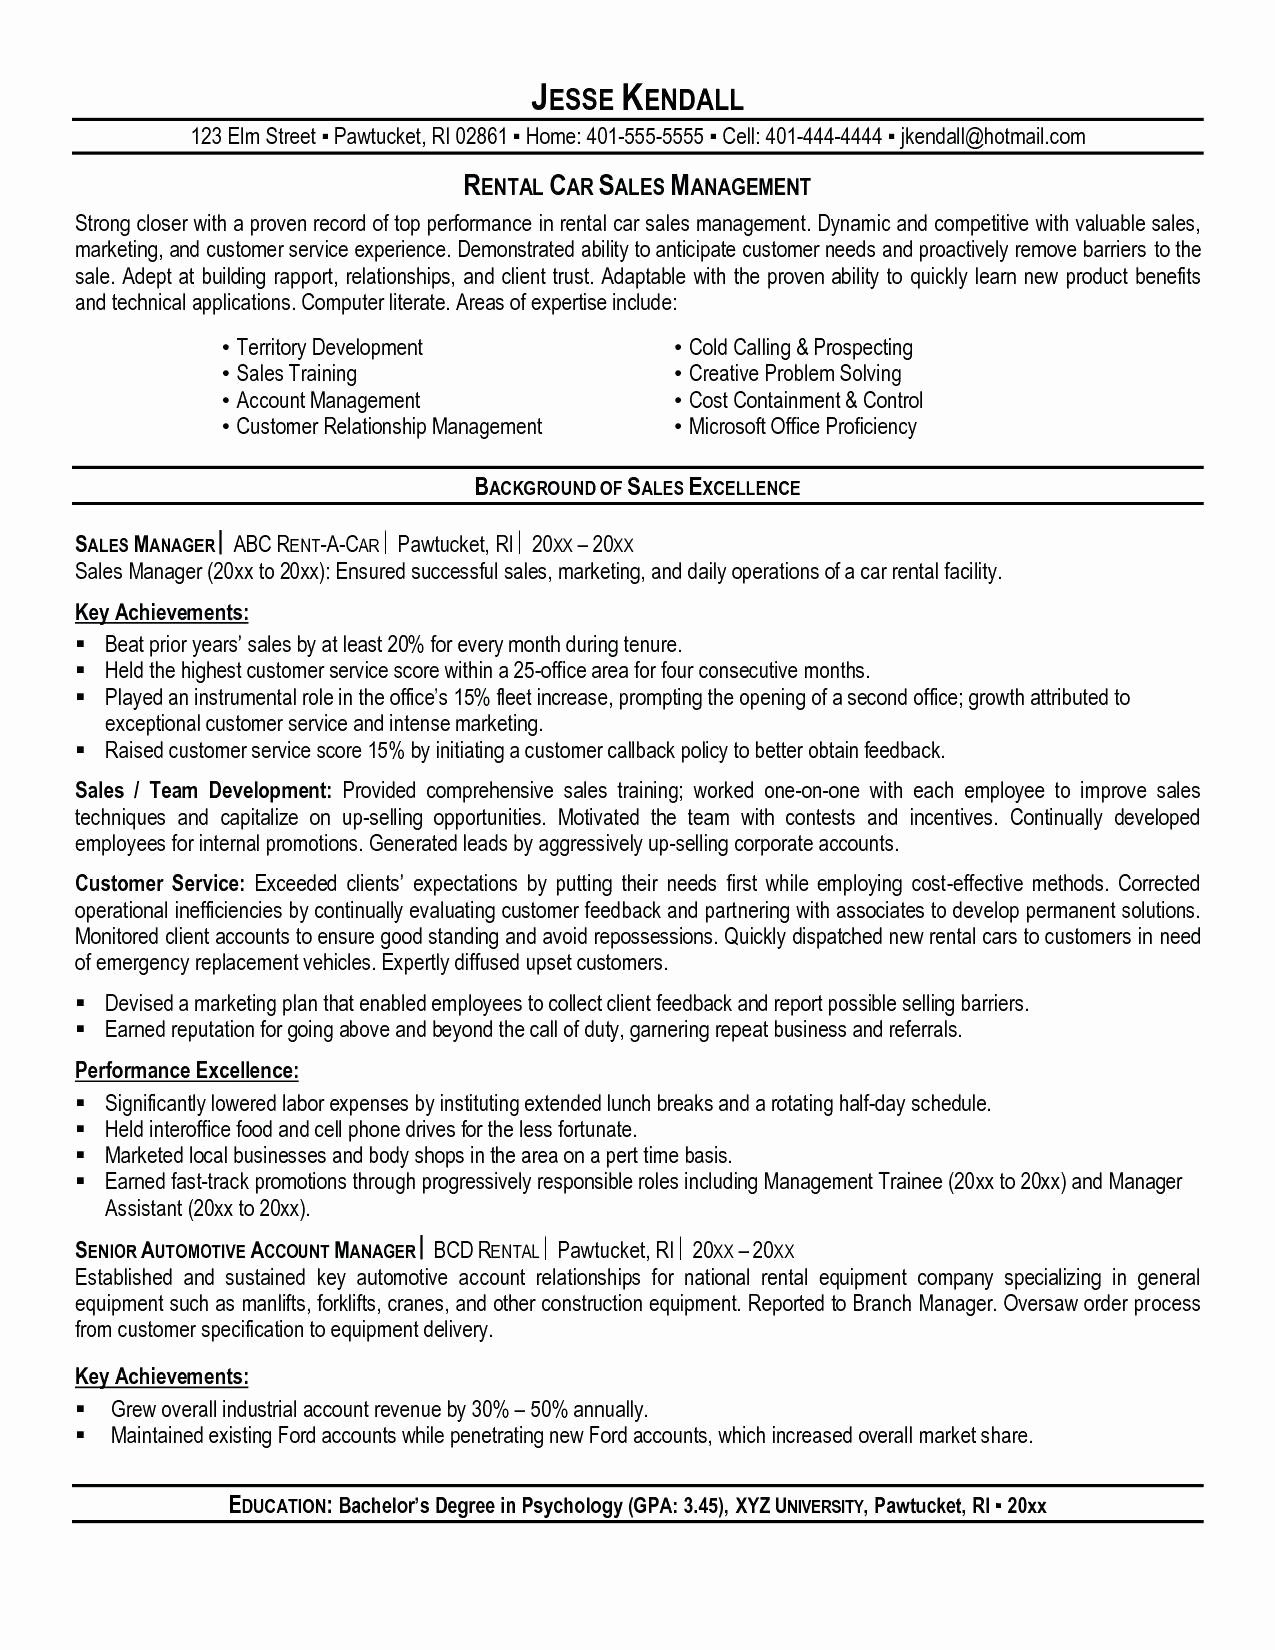 Elegant Car Sales Consultant Job Description Resume Perfect Cover Letter For Resume Resume Examples Sales Resume